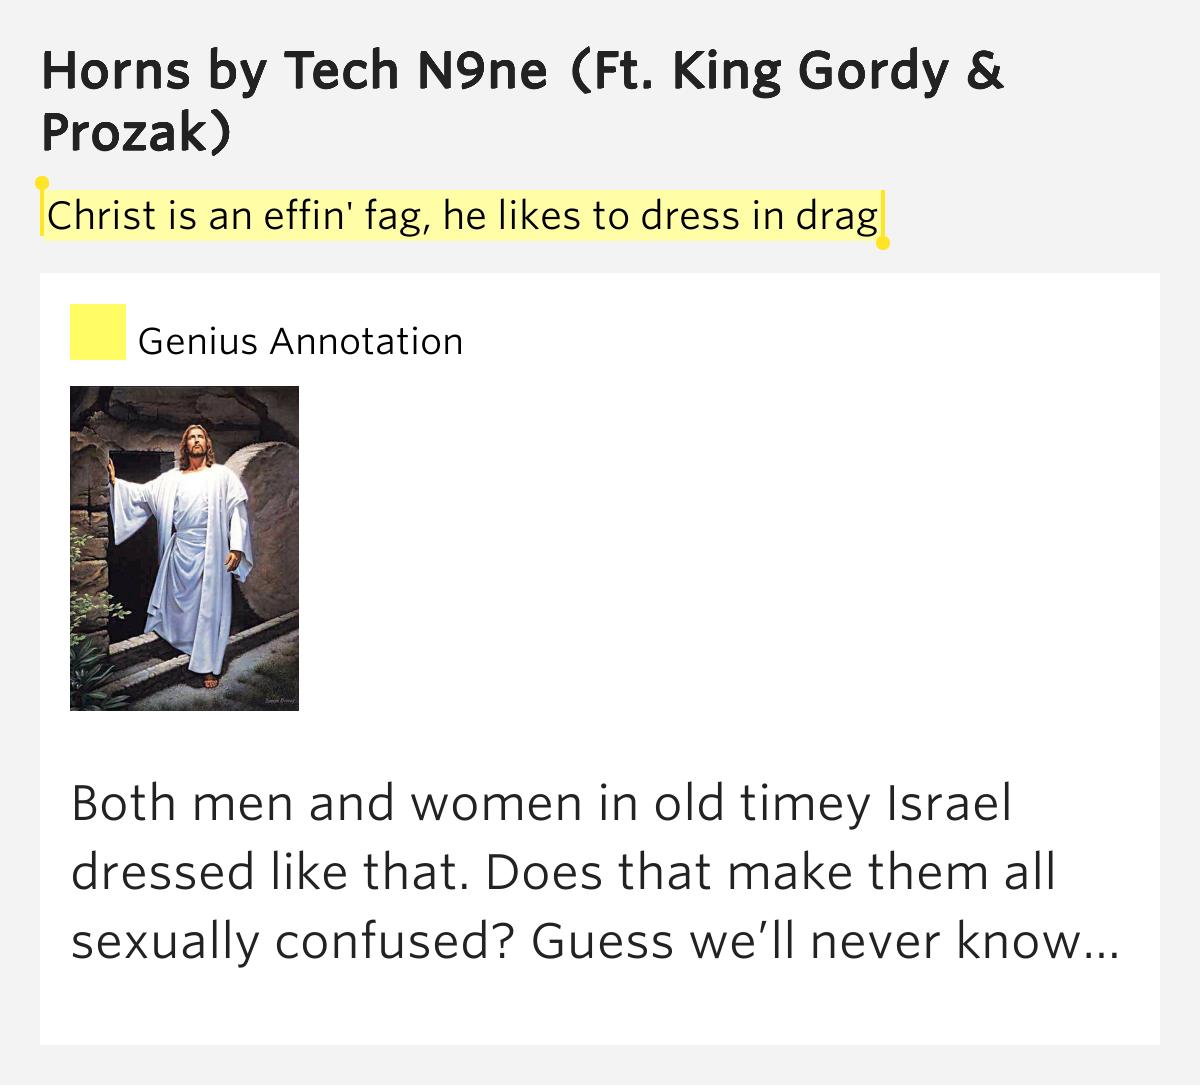 Christ is an effin' fag, he likes to dress in drag – Horns Horns Lyrics